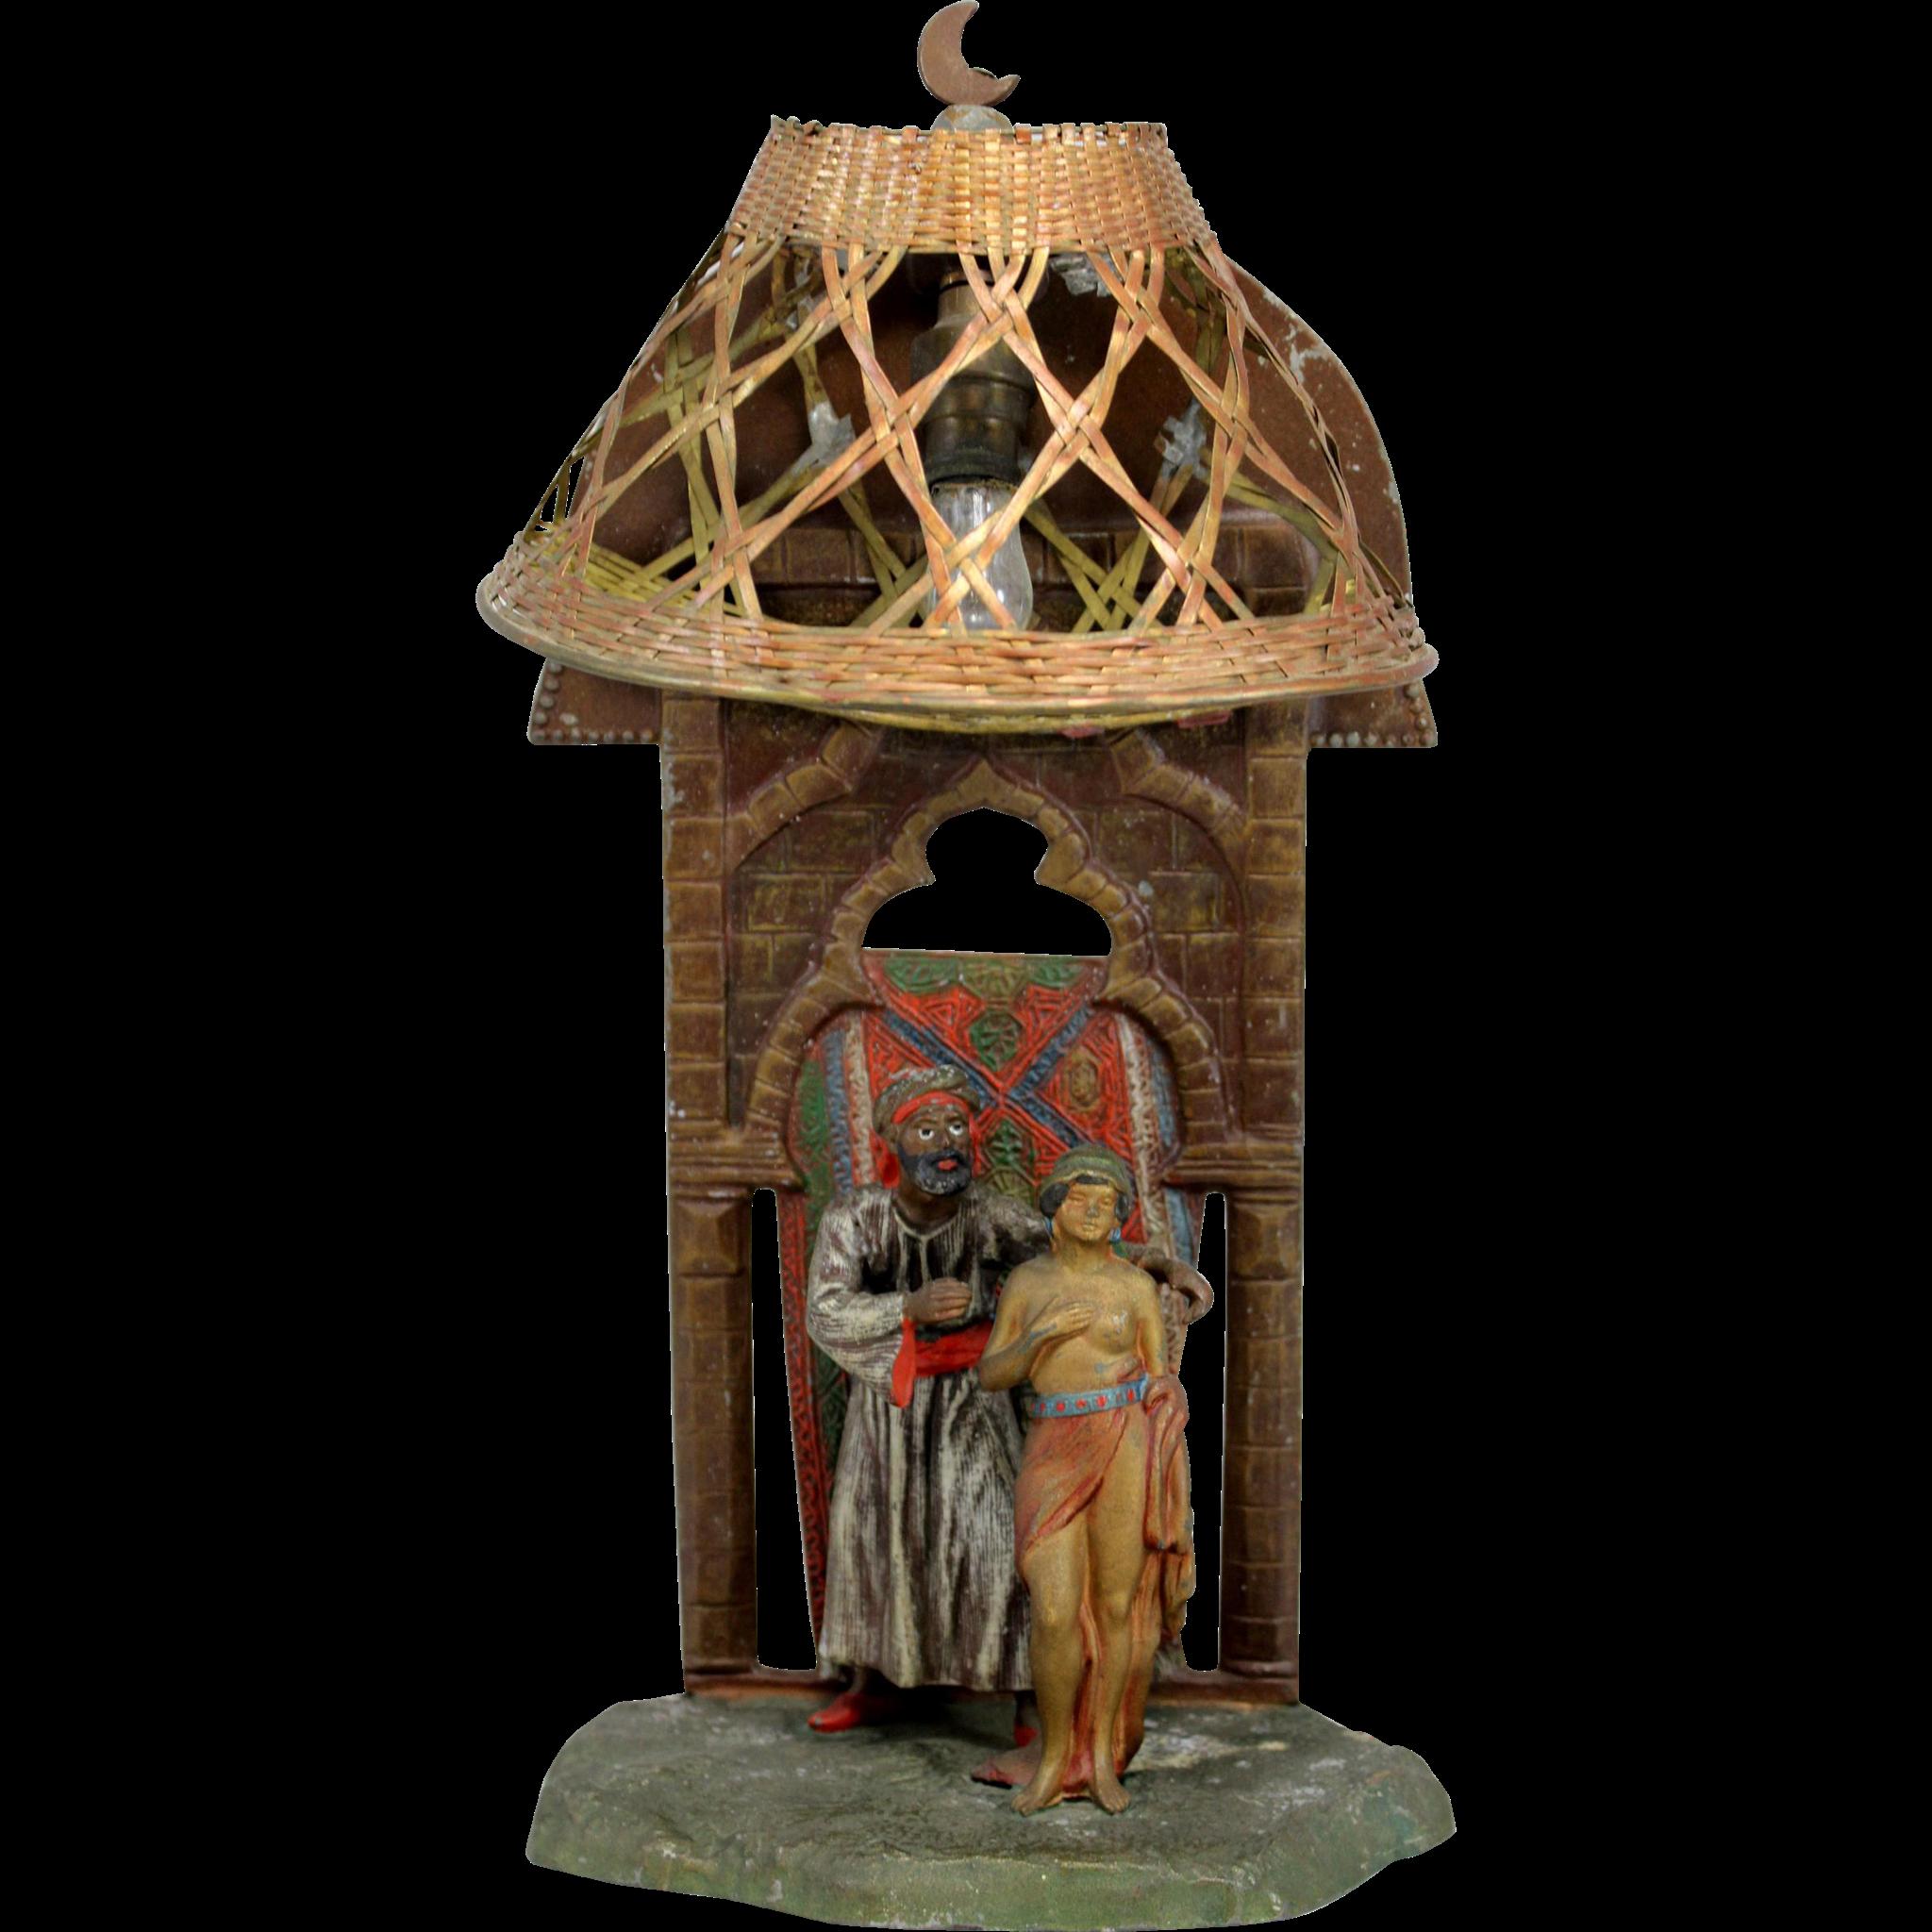 Vienna Bronze Polychrome Orientalist Lamp with Figures